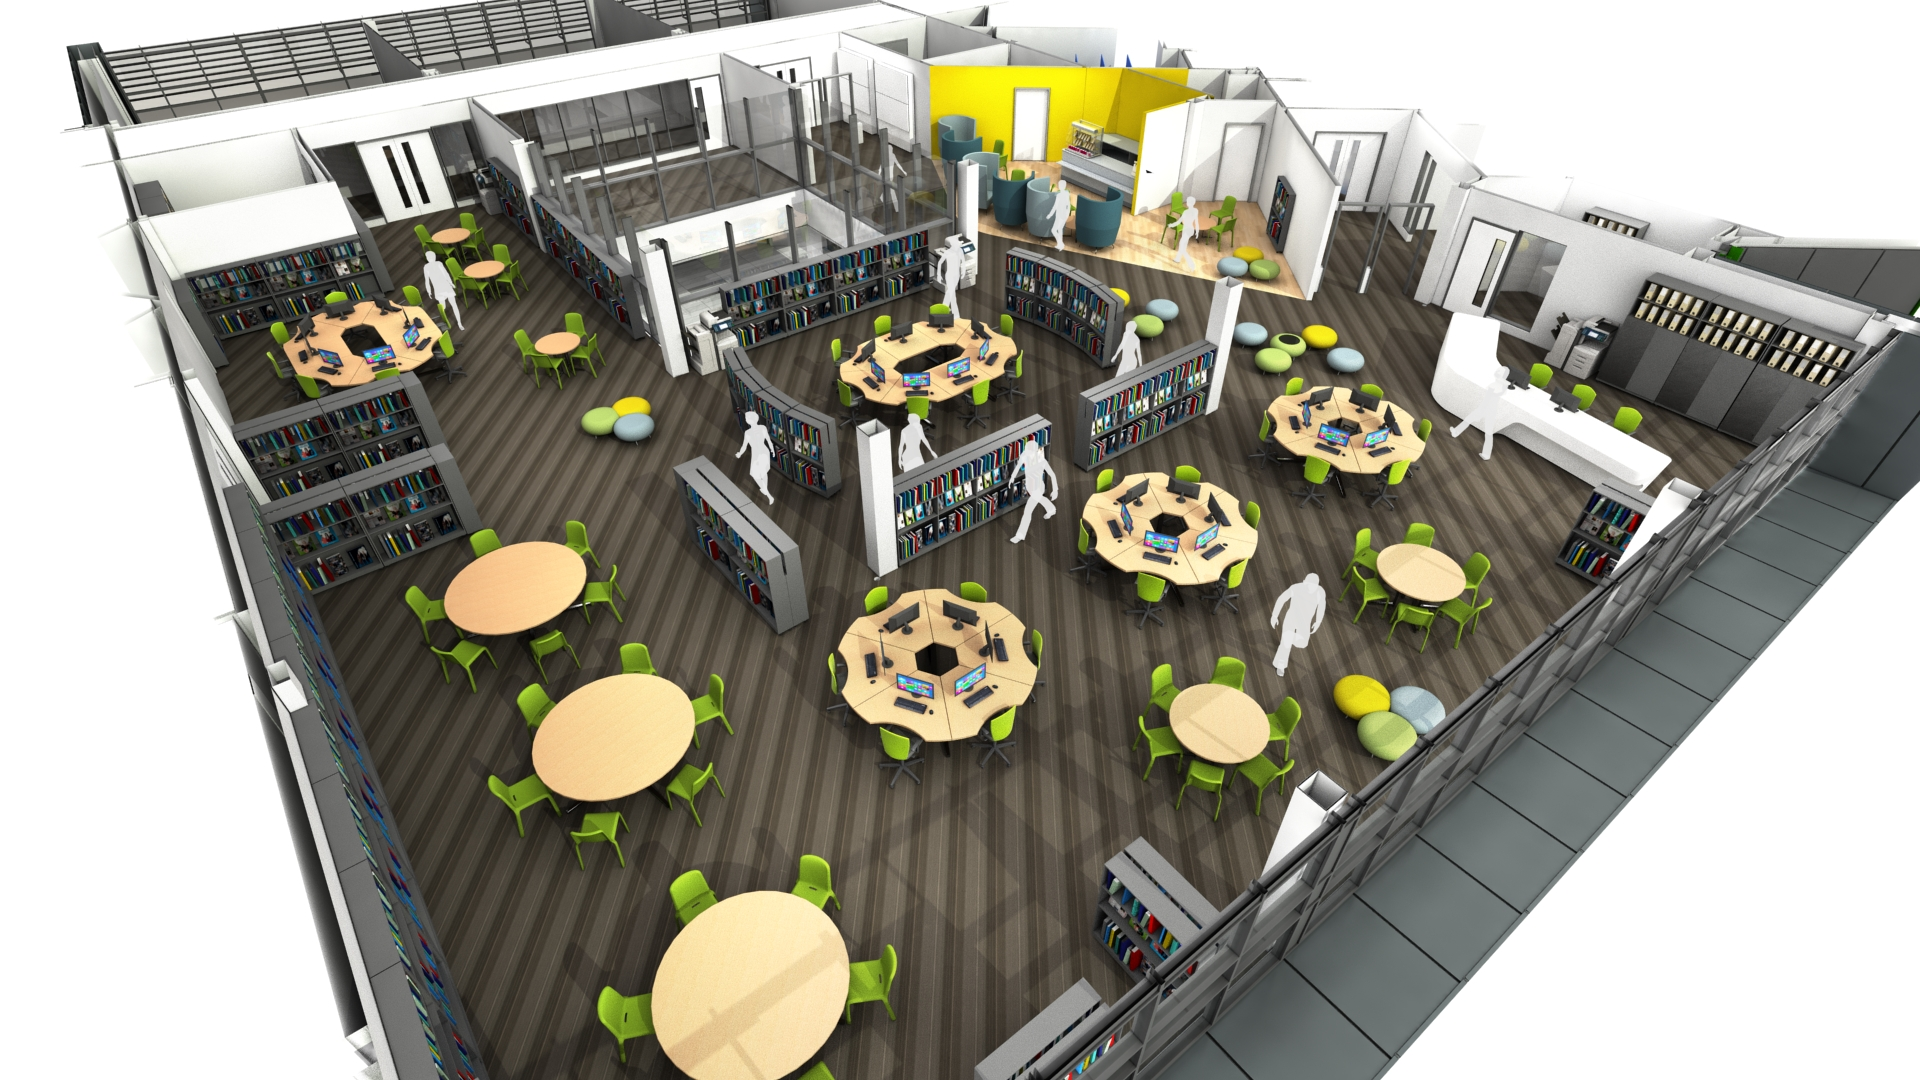 South Essex College Architectural 3D Render-15.jpg